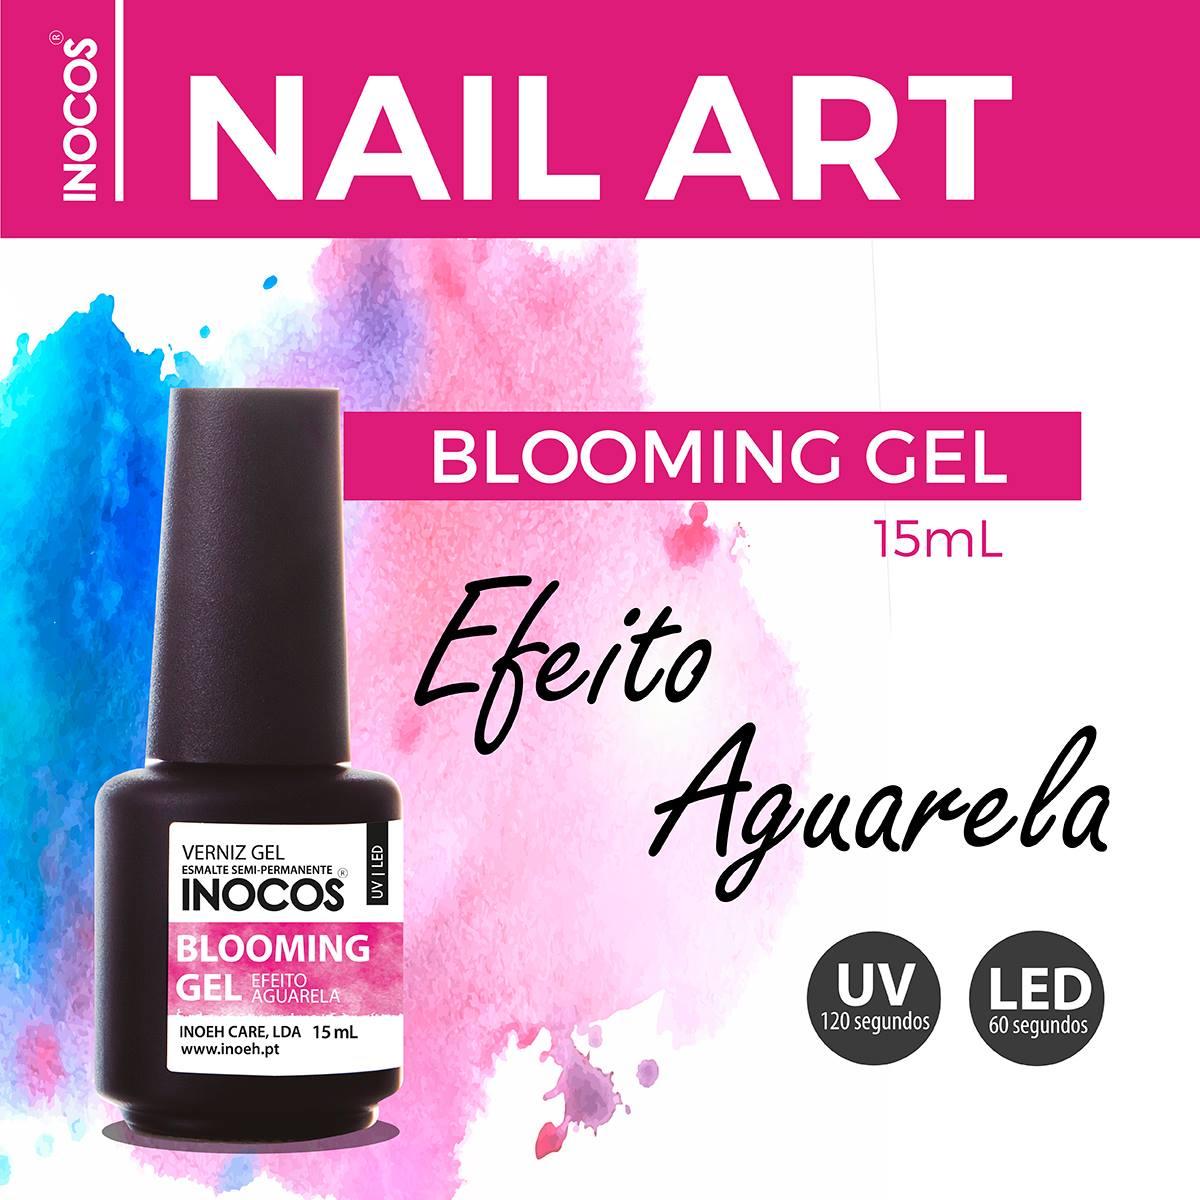 Blooming Gel Inocos - Efeito Aguarela